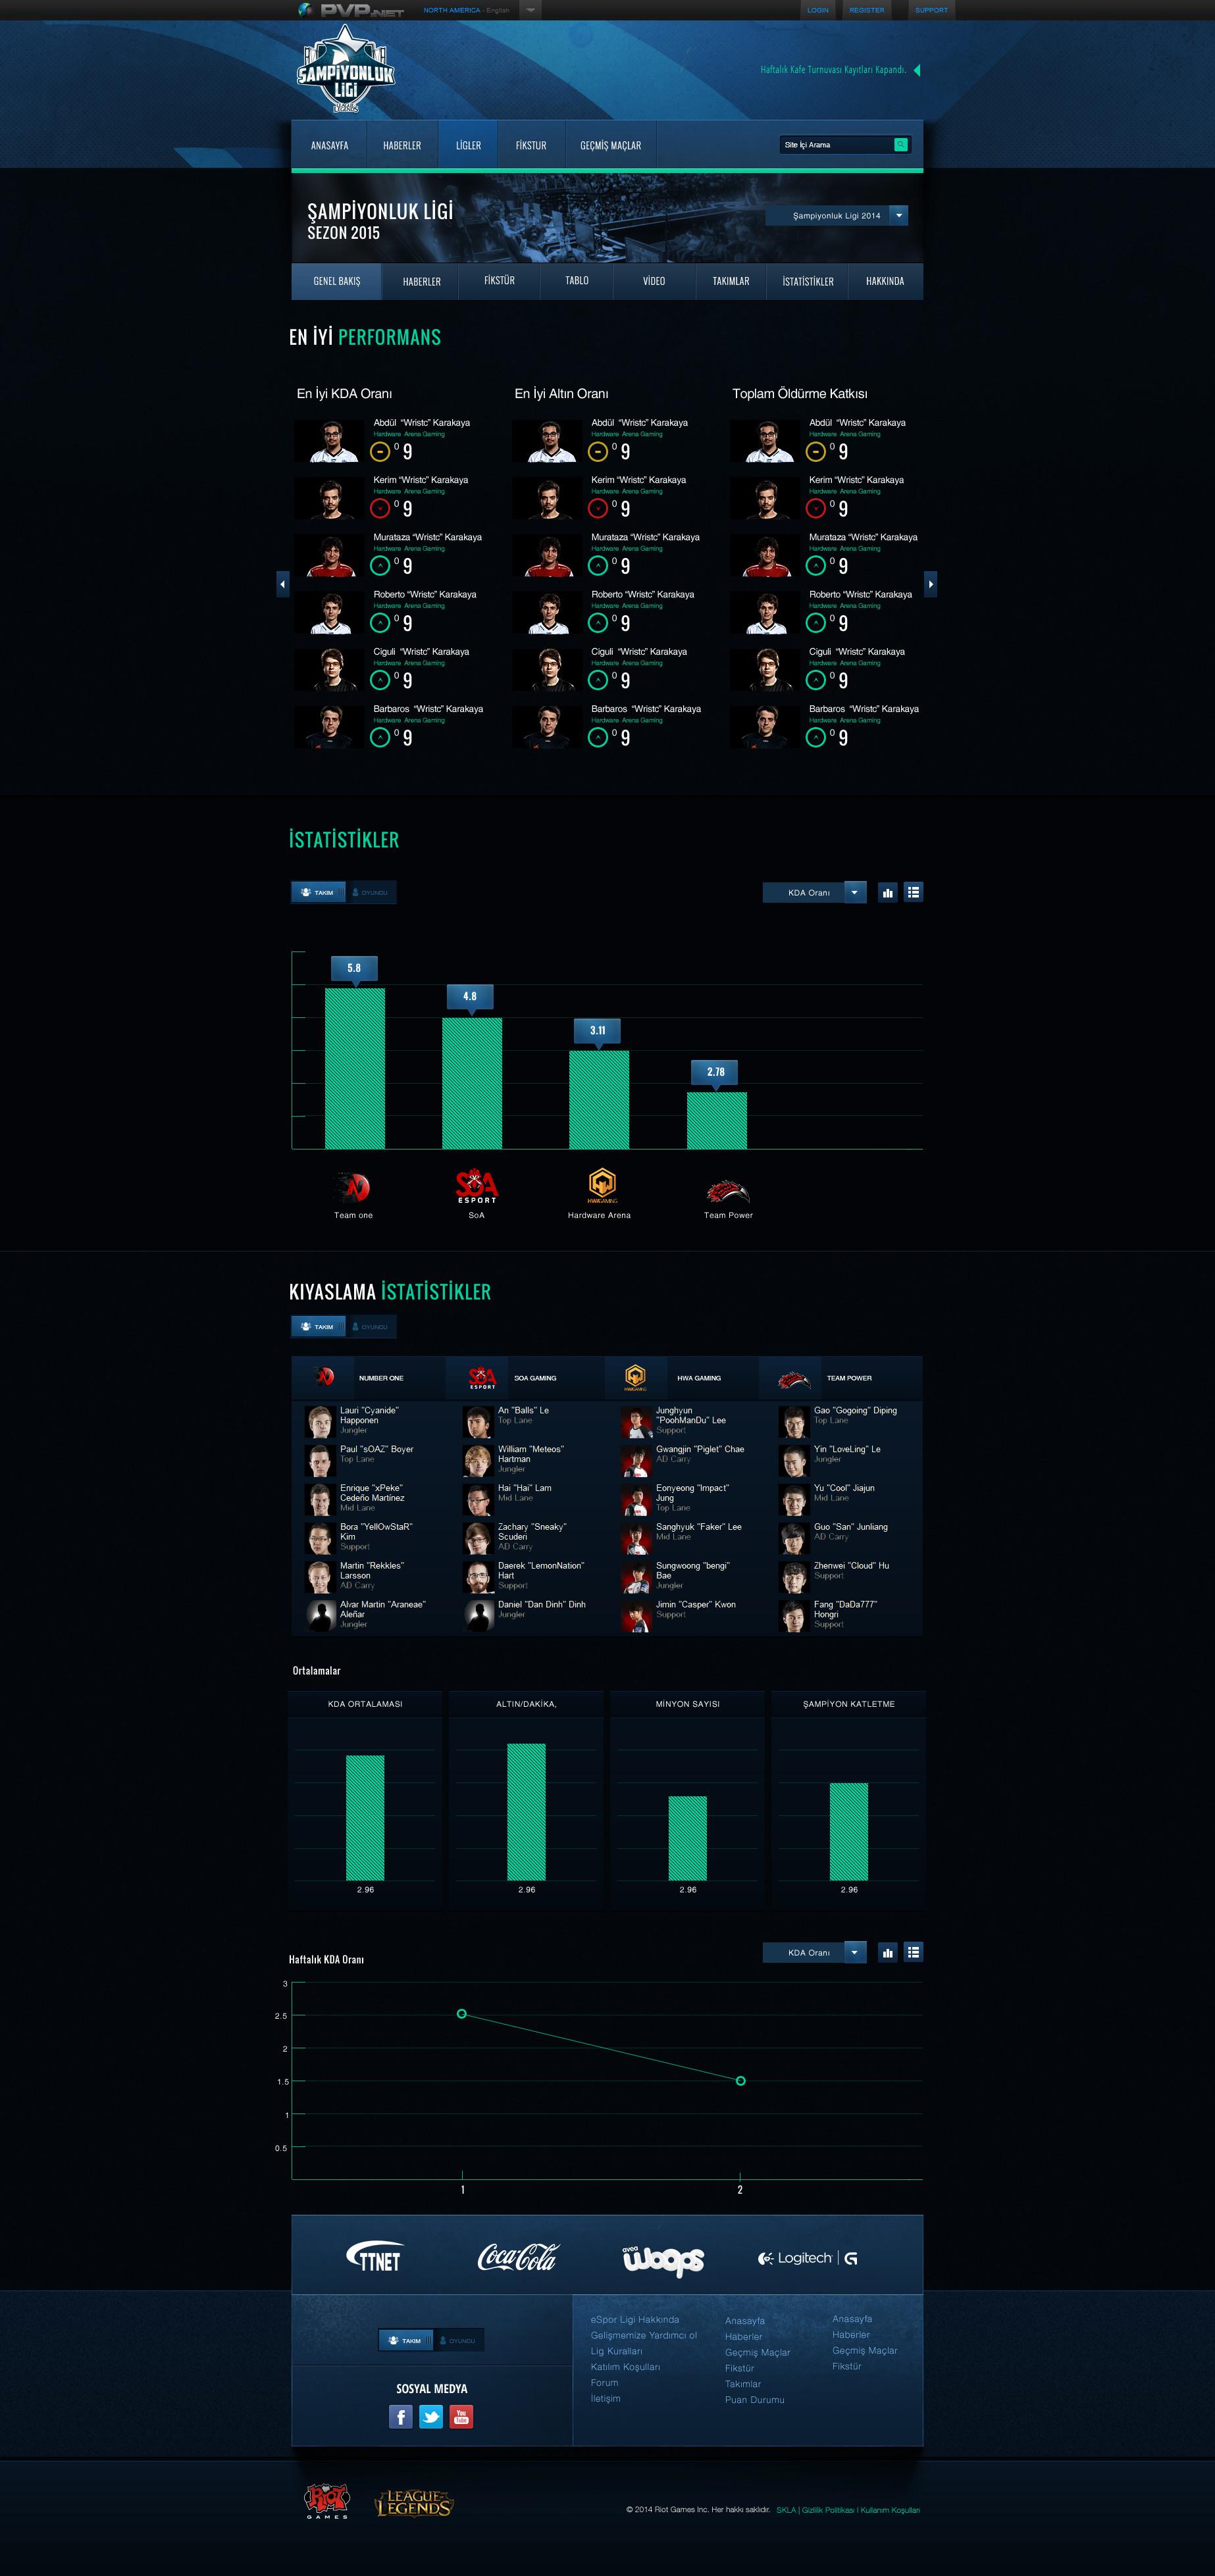 Cem akkaya lolespor leagues stats